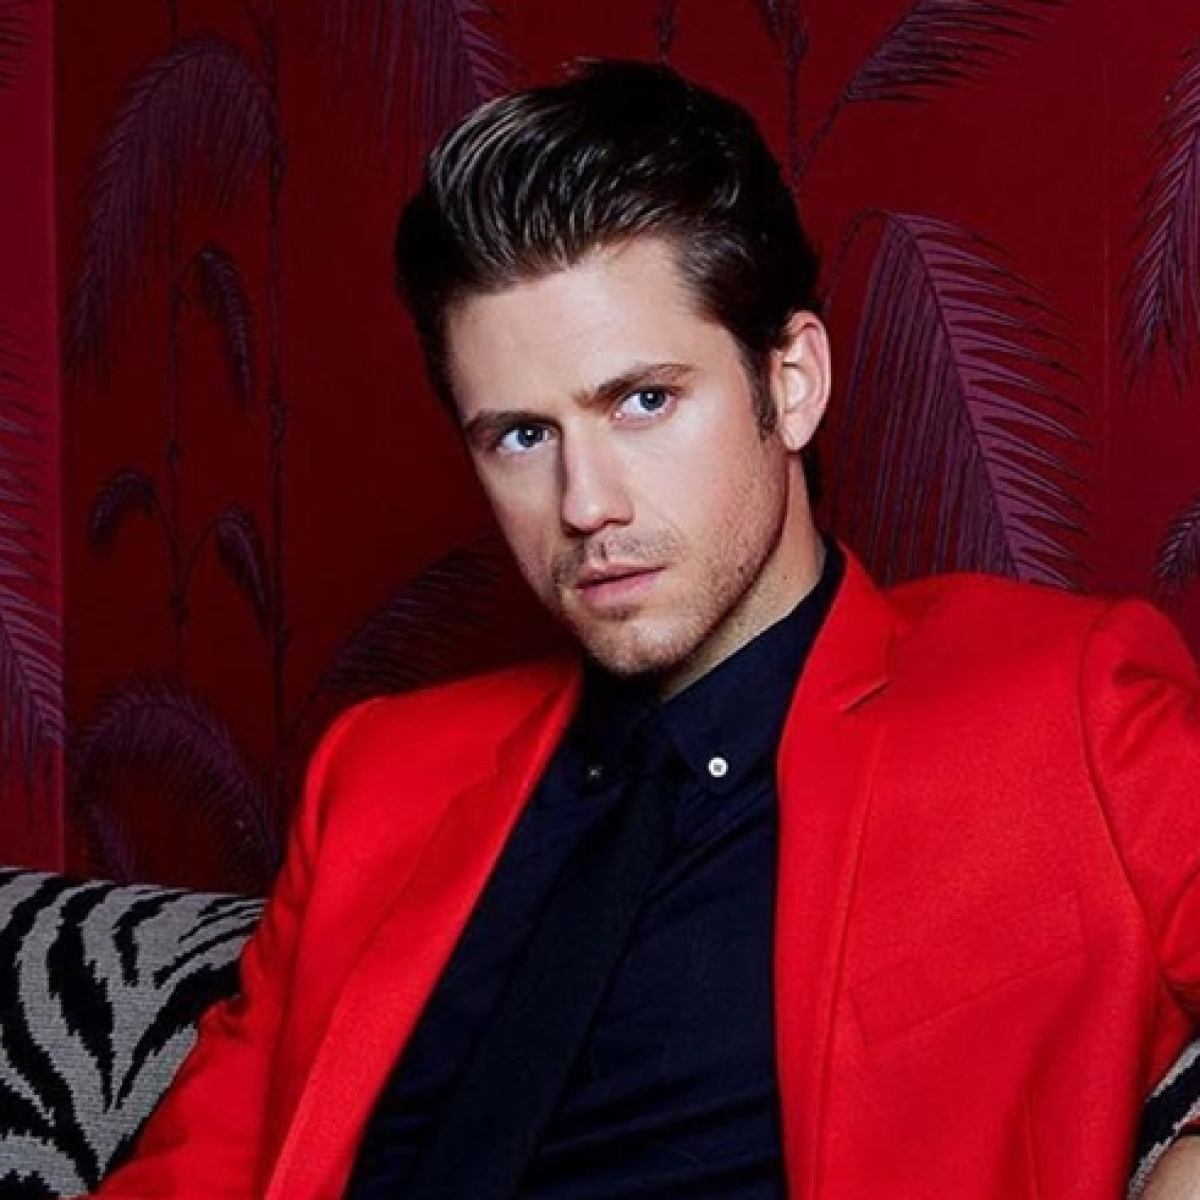 'Les Miserables' star Aaron Tveit tests positive for coronavirus